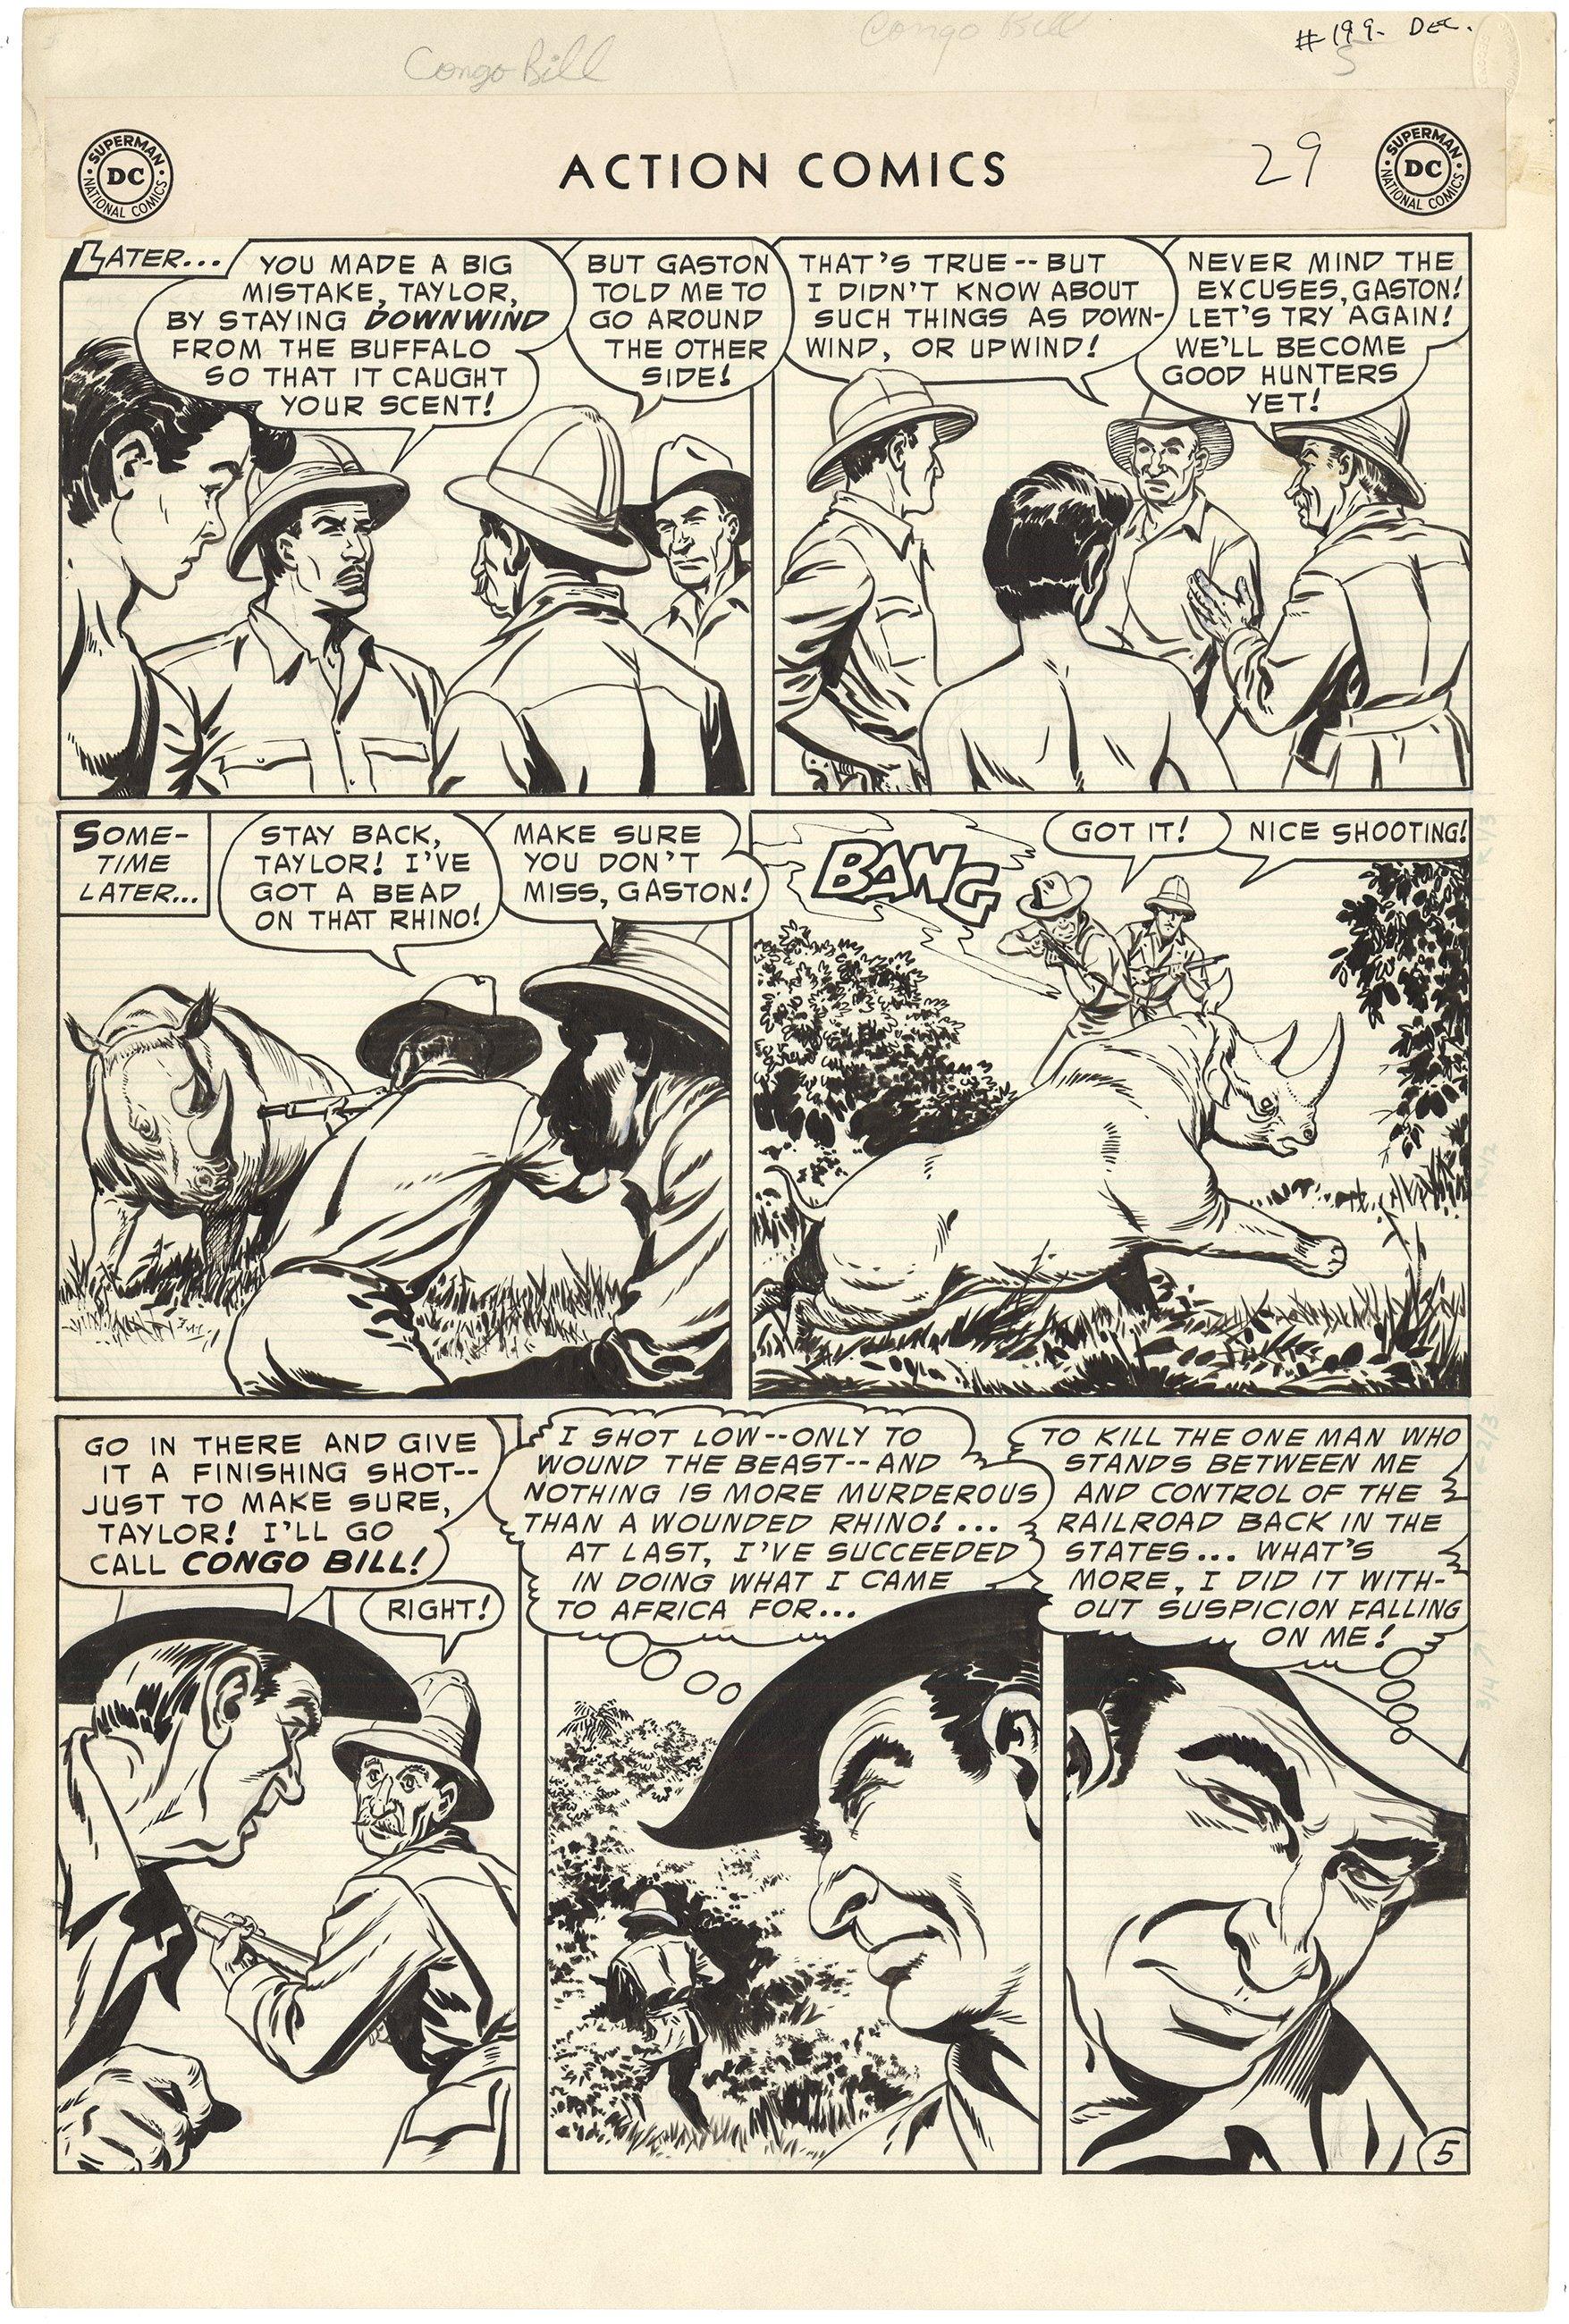 Action Comics #199 p5 (Large Art)(Congo Bill)